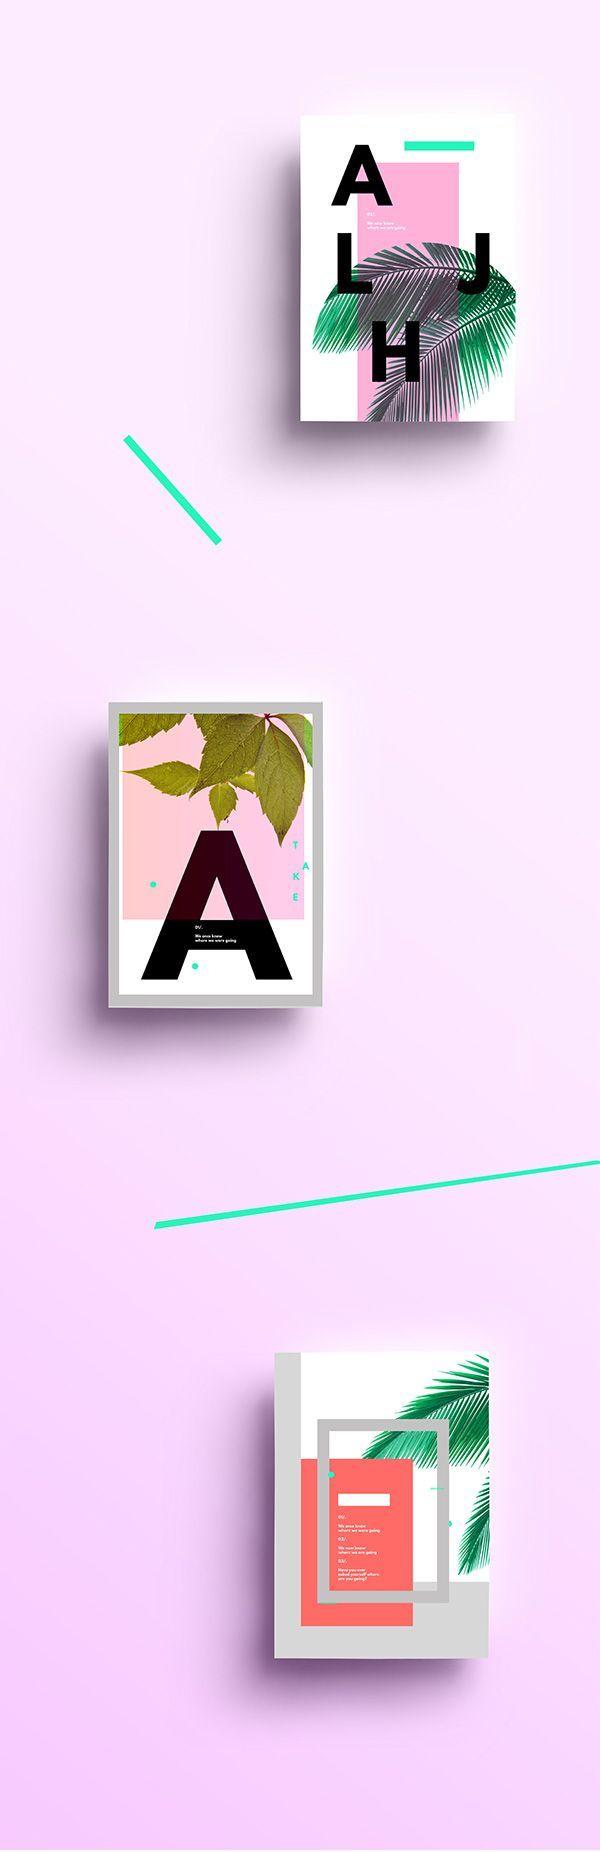 Graphic Design Inspiration . Alpha on Behance #printspiration